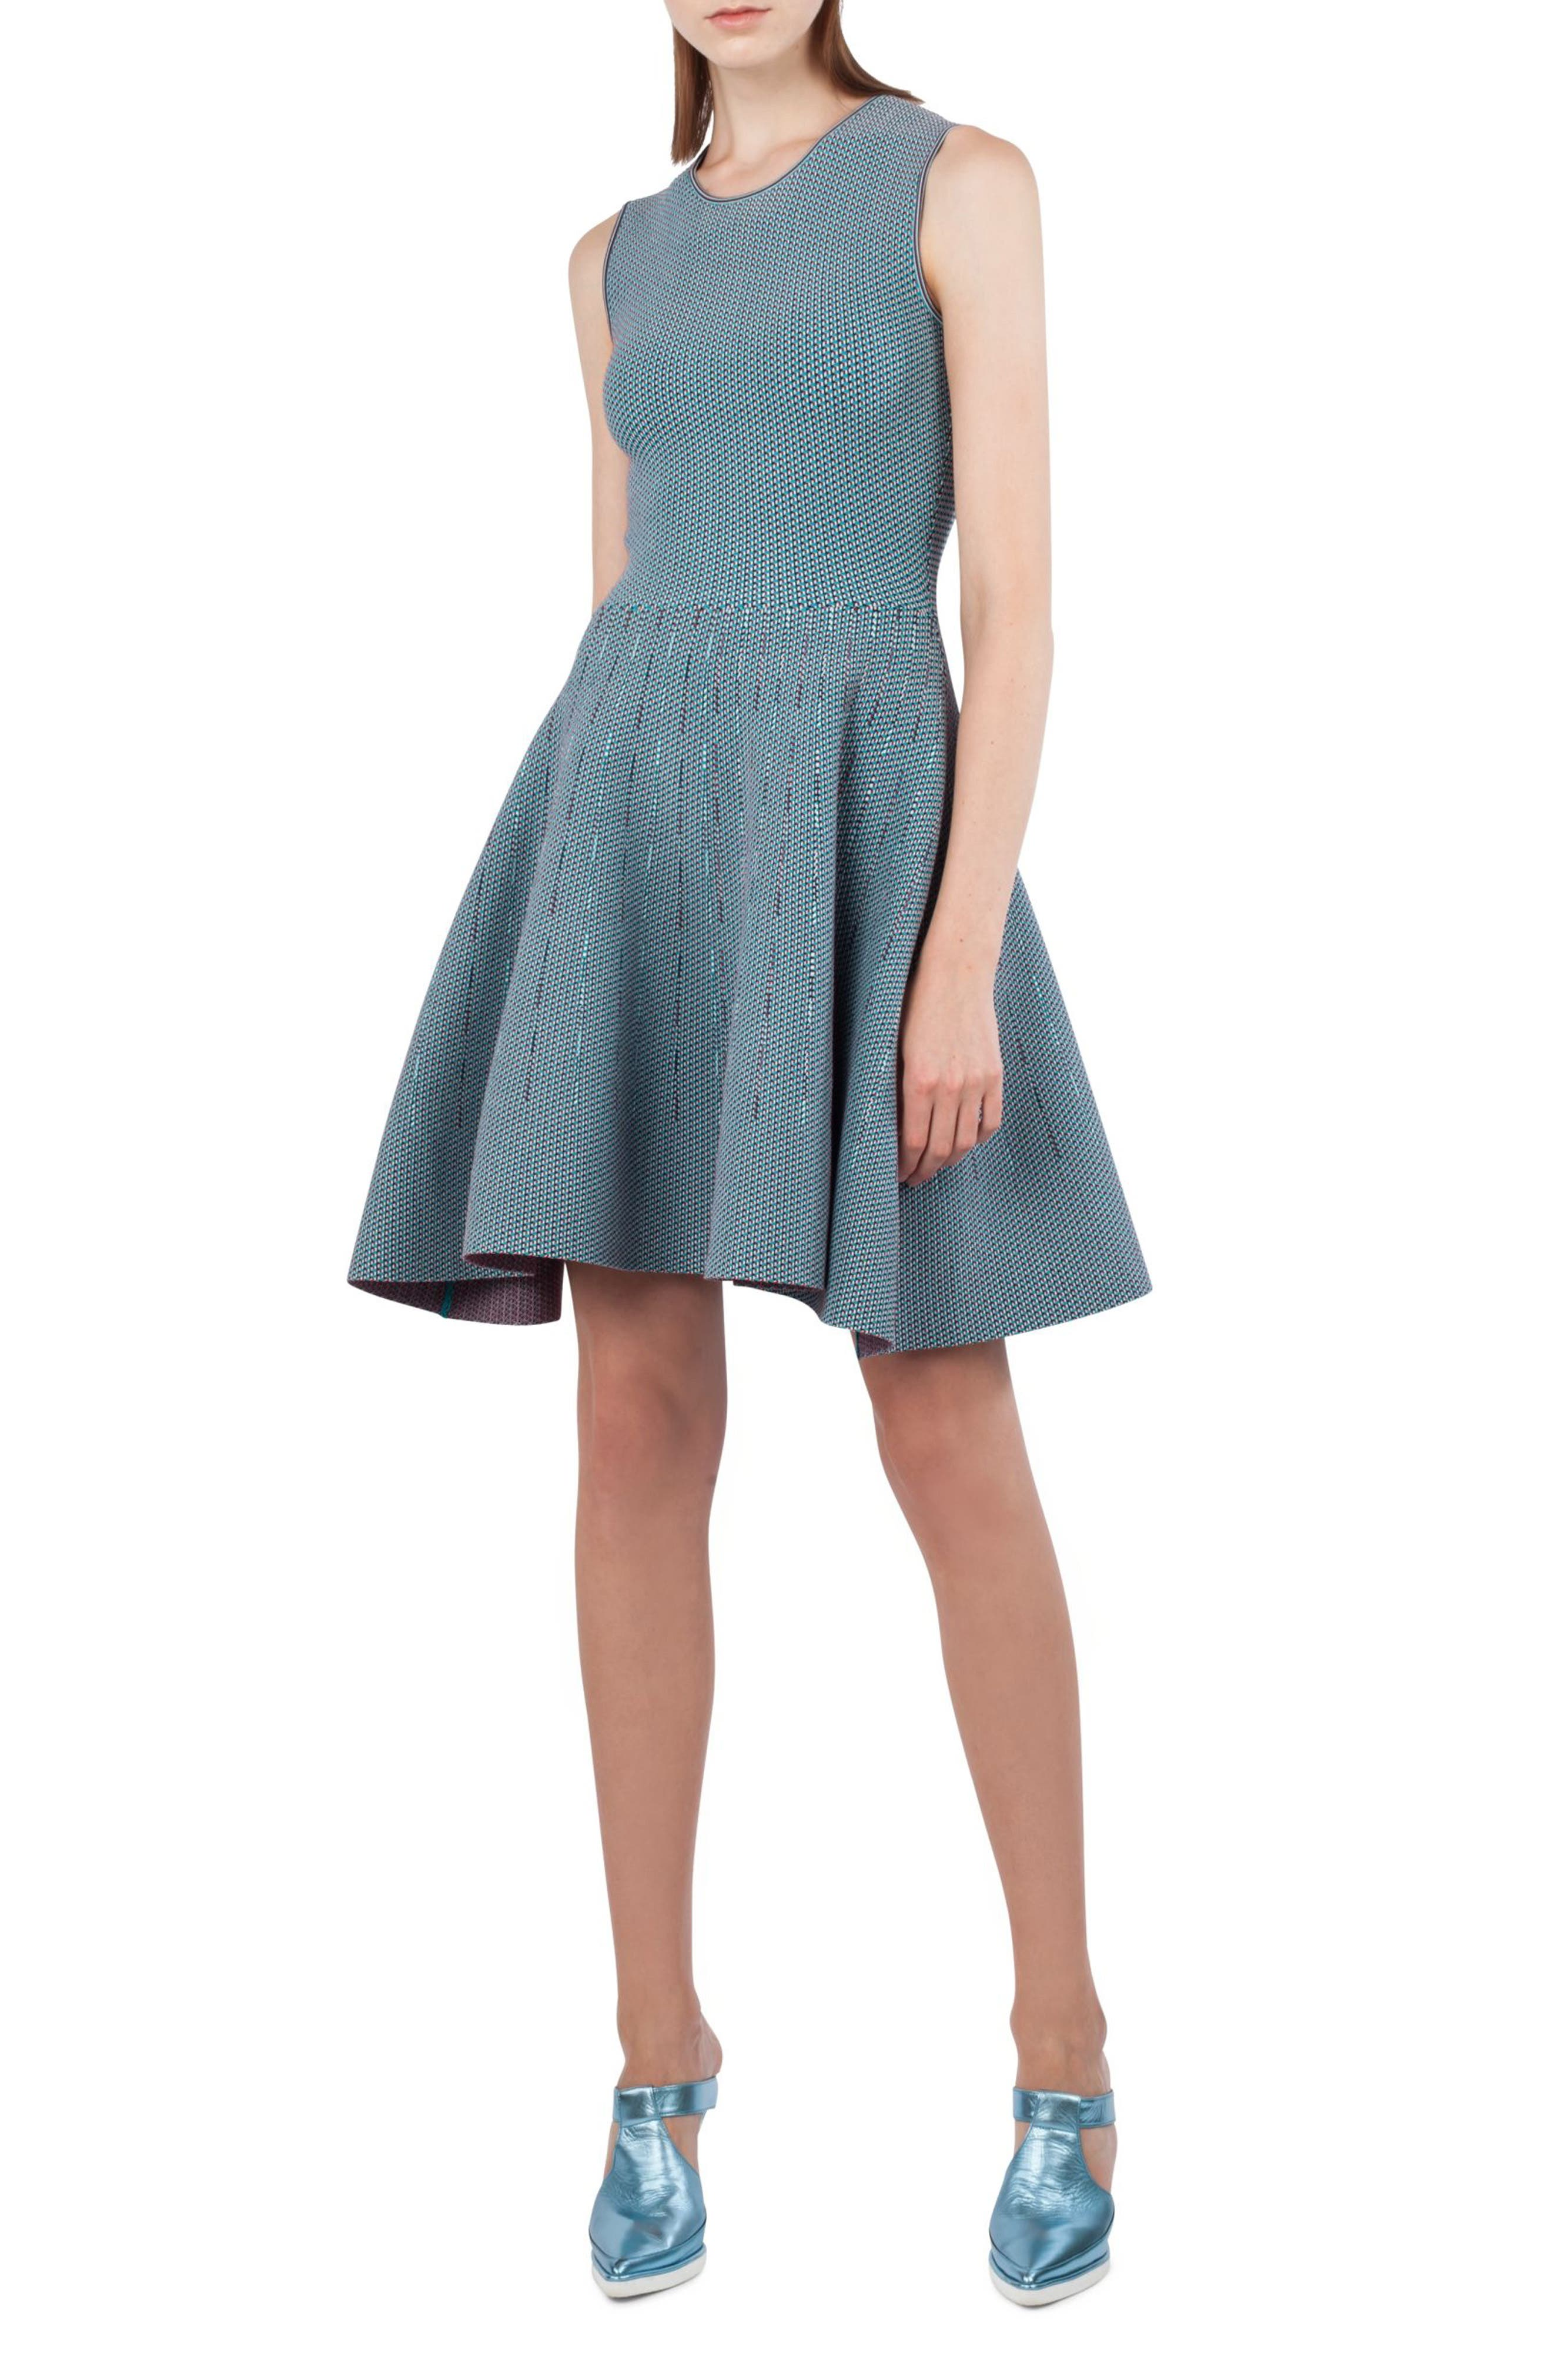 Fantasy Jacquard Knit Dress,                         Main,                         color, 471